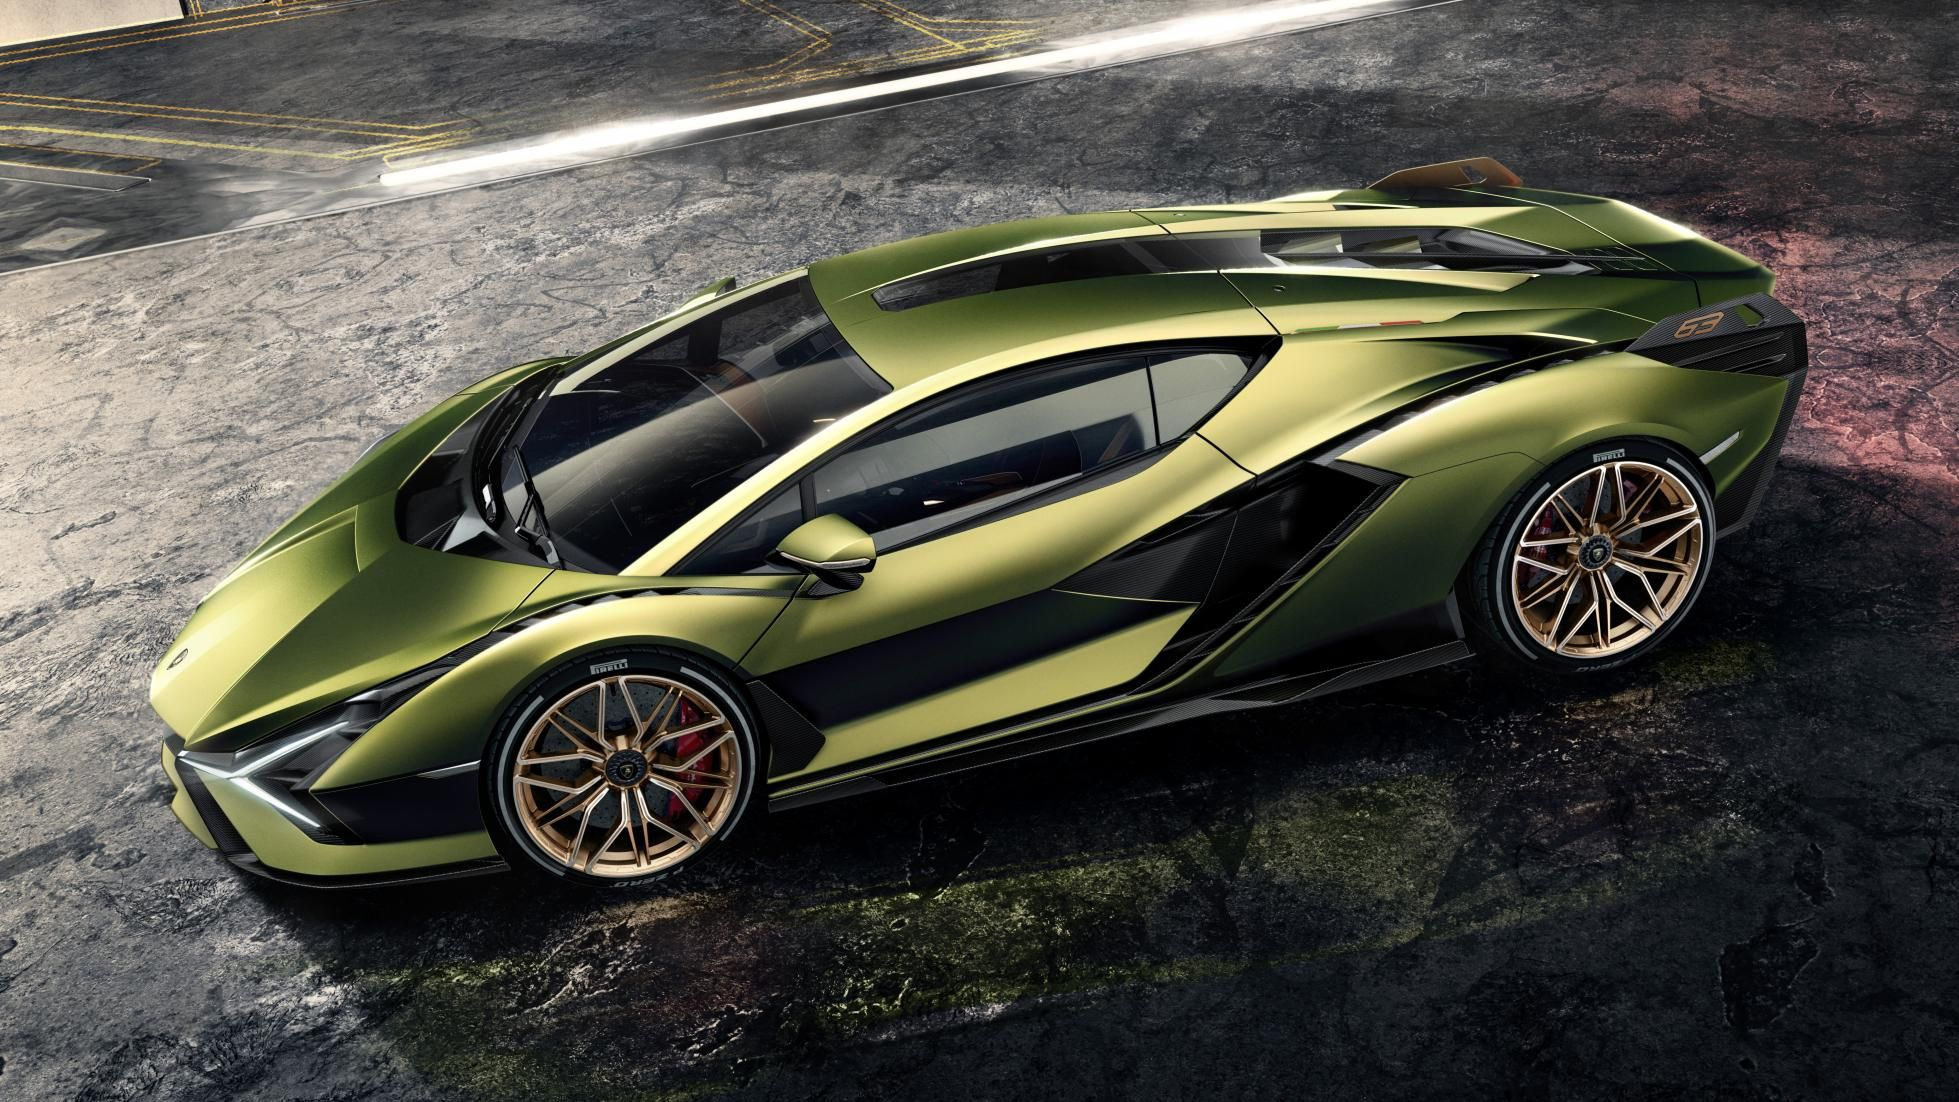 The Lamborghini Sian Is A Hybrid V12 With Supercapacitors Super Cars Lamborghini Fastest Lamborghini